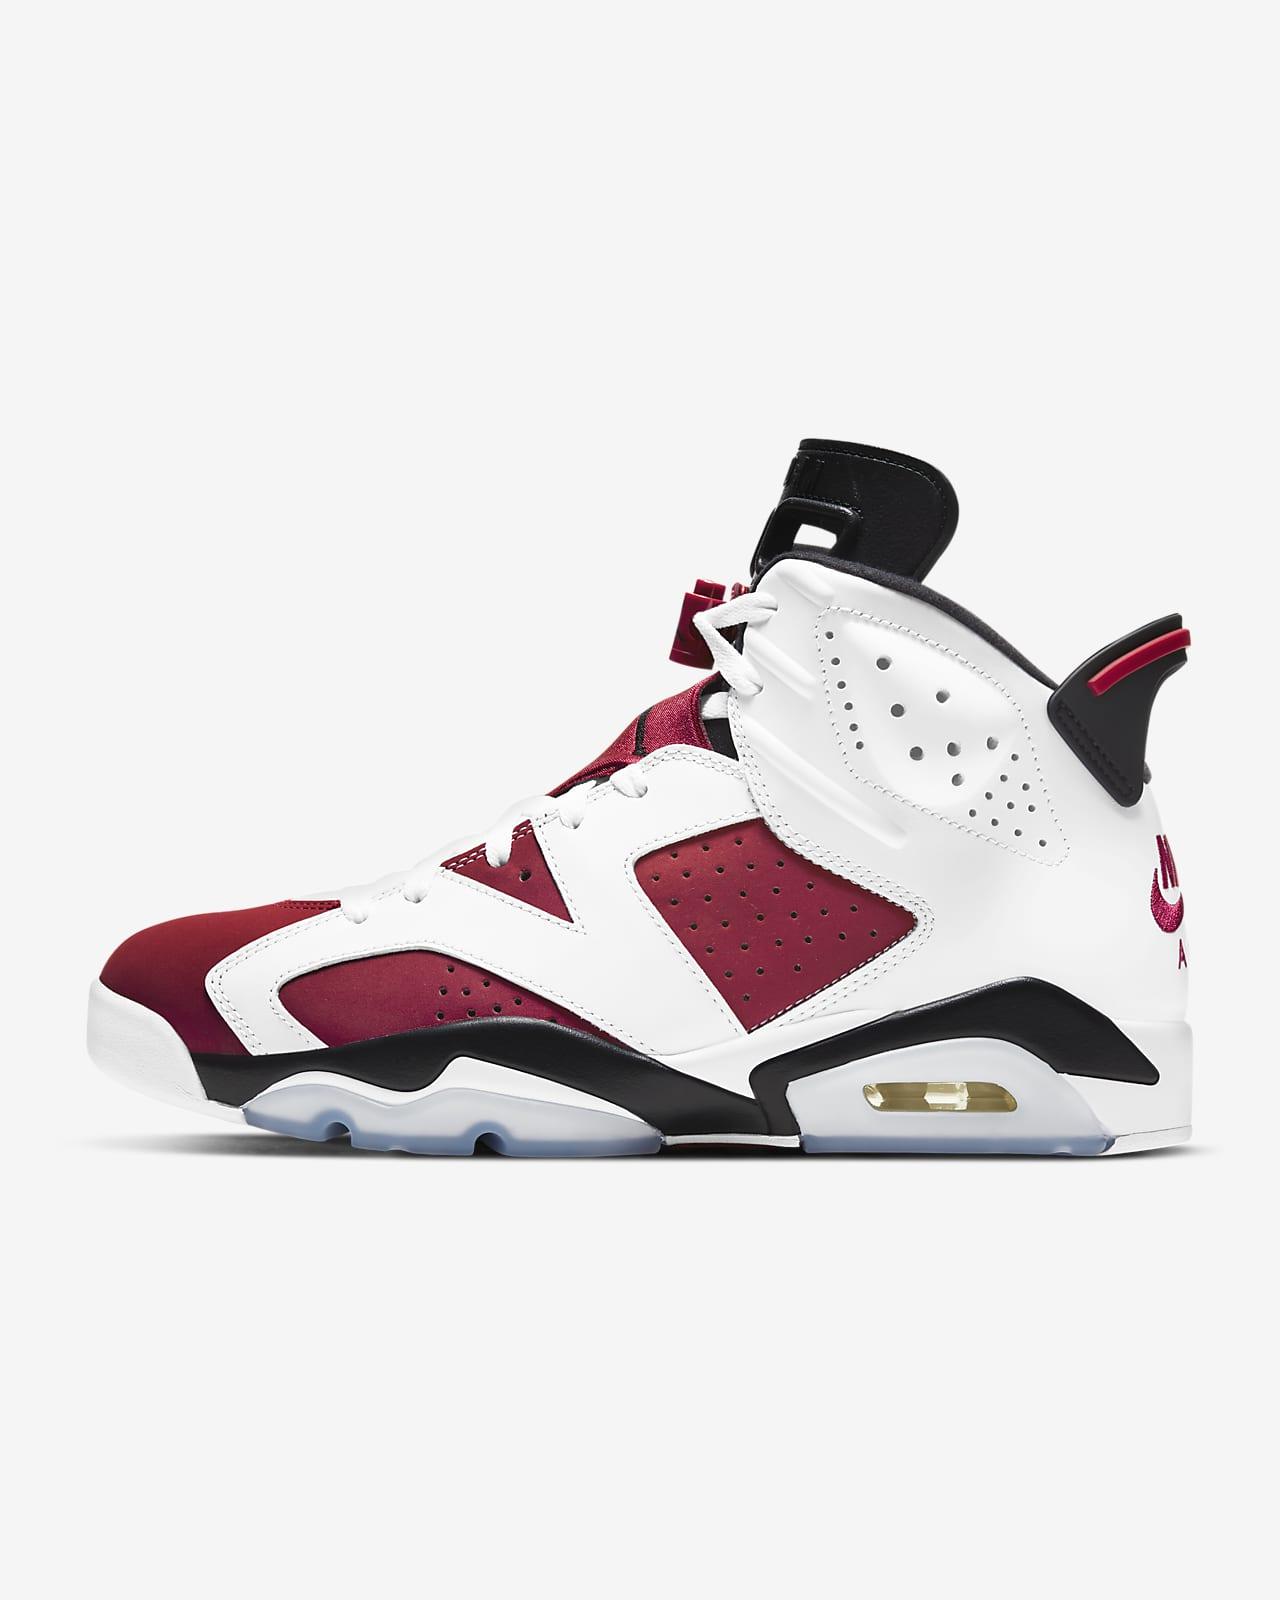 Air Jordan 6 Retro Shoe